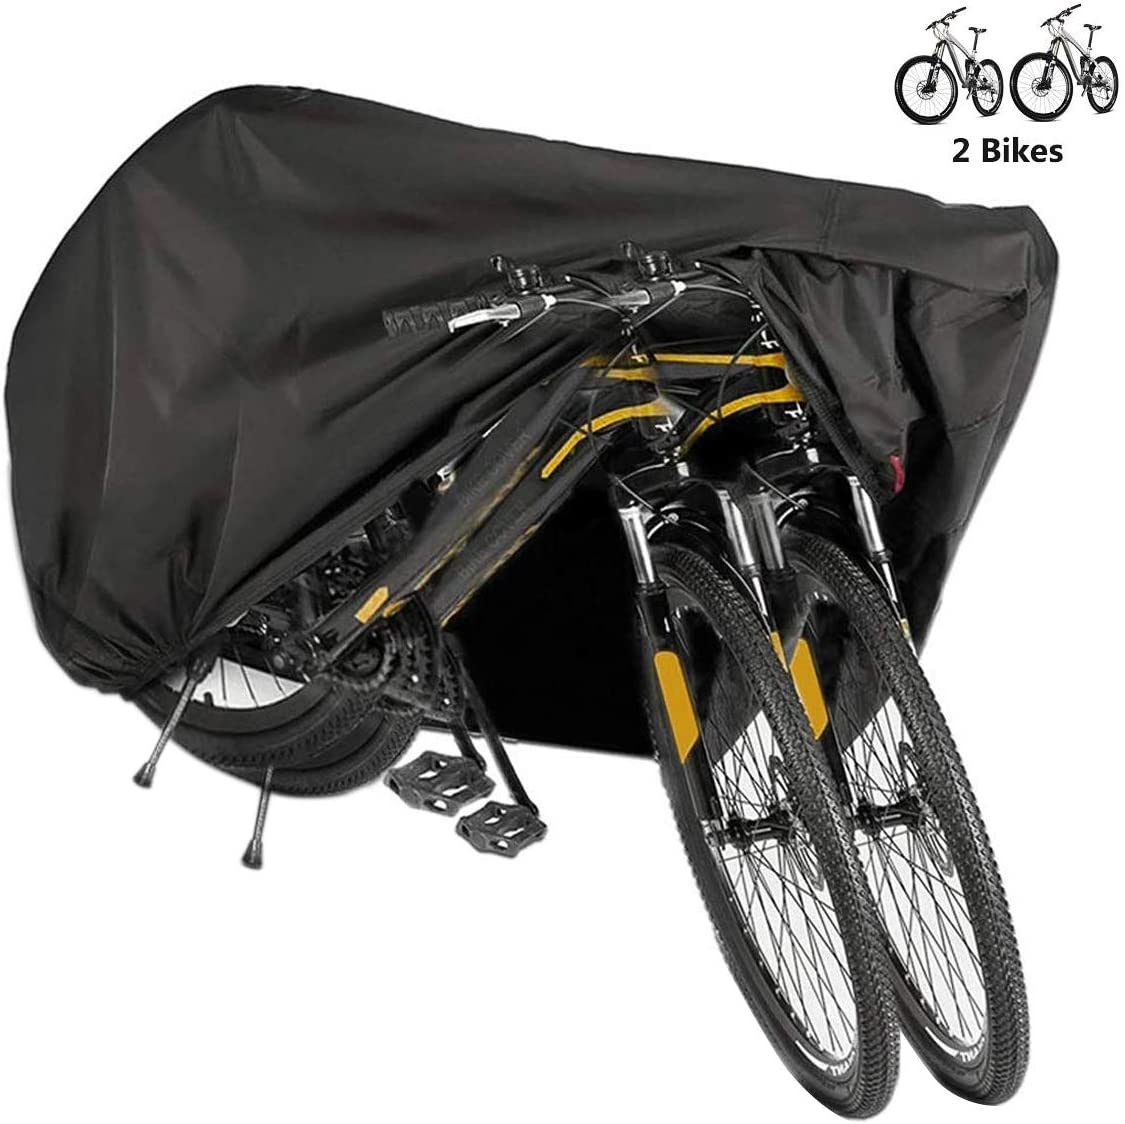 BICASLOVE Funda Bicicleta, Nylón 210D Anti Polvo Resistente al Agua a Prueba de UV Cubierta Bicicleta para Bicicleta de Montaña y Bicicleta de Carretera